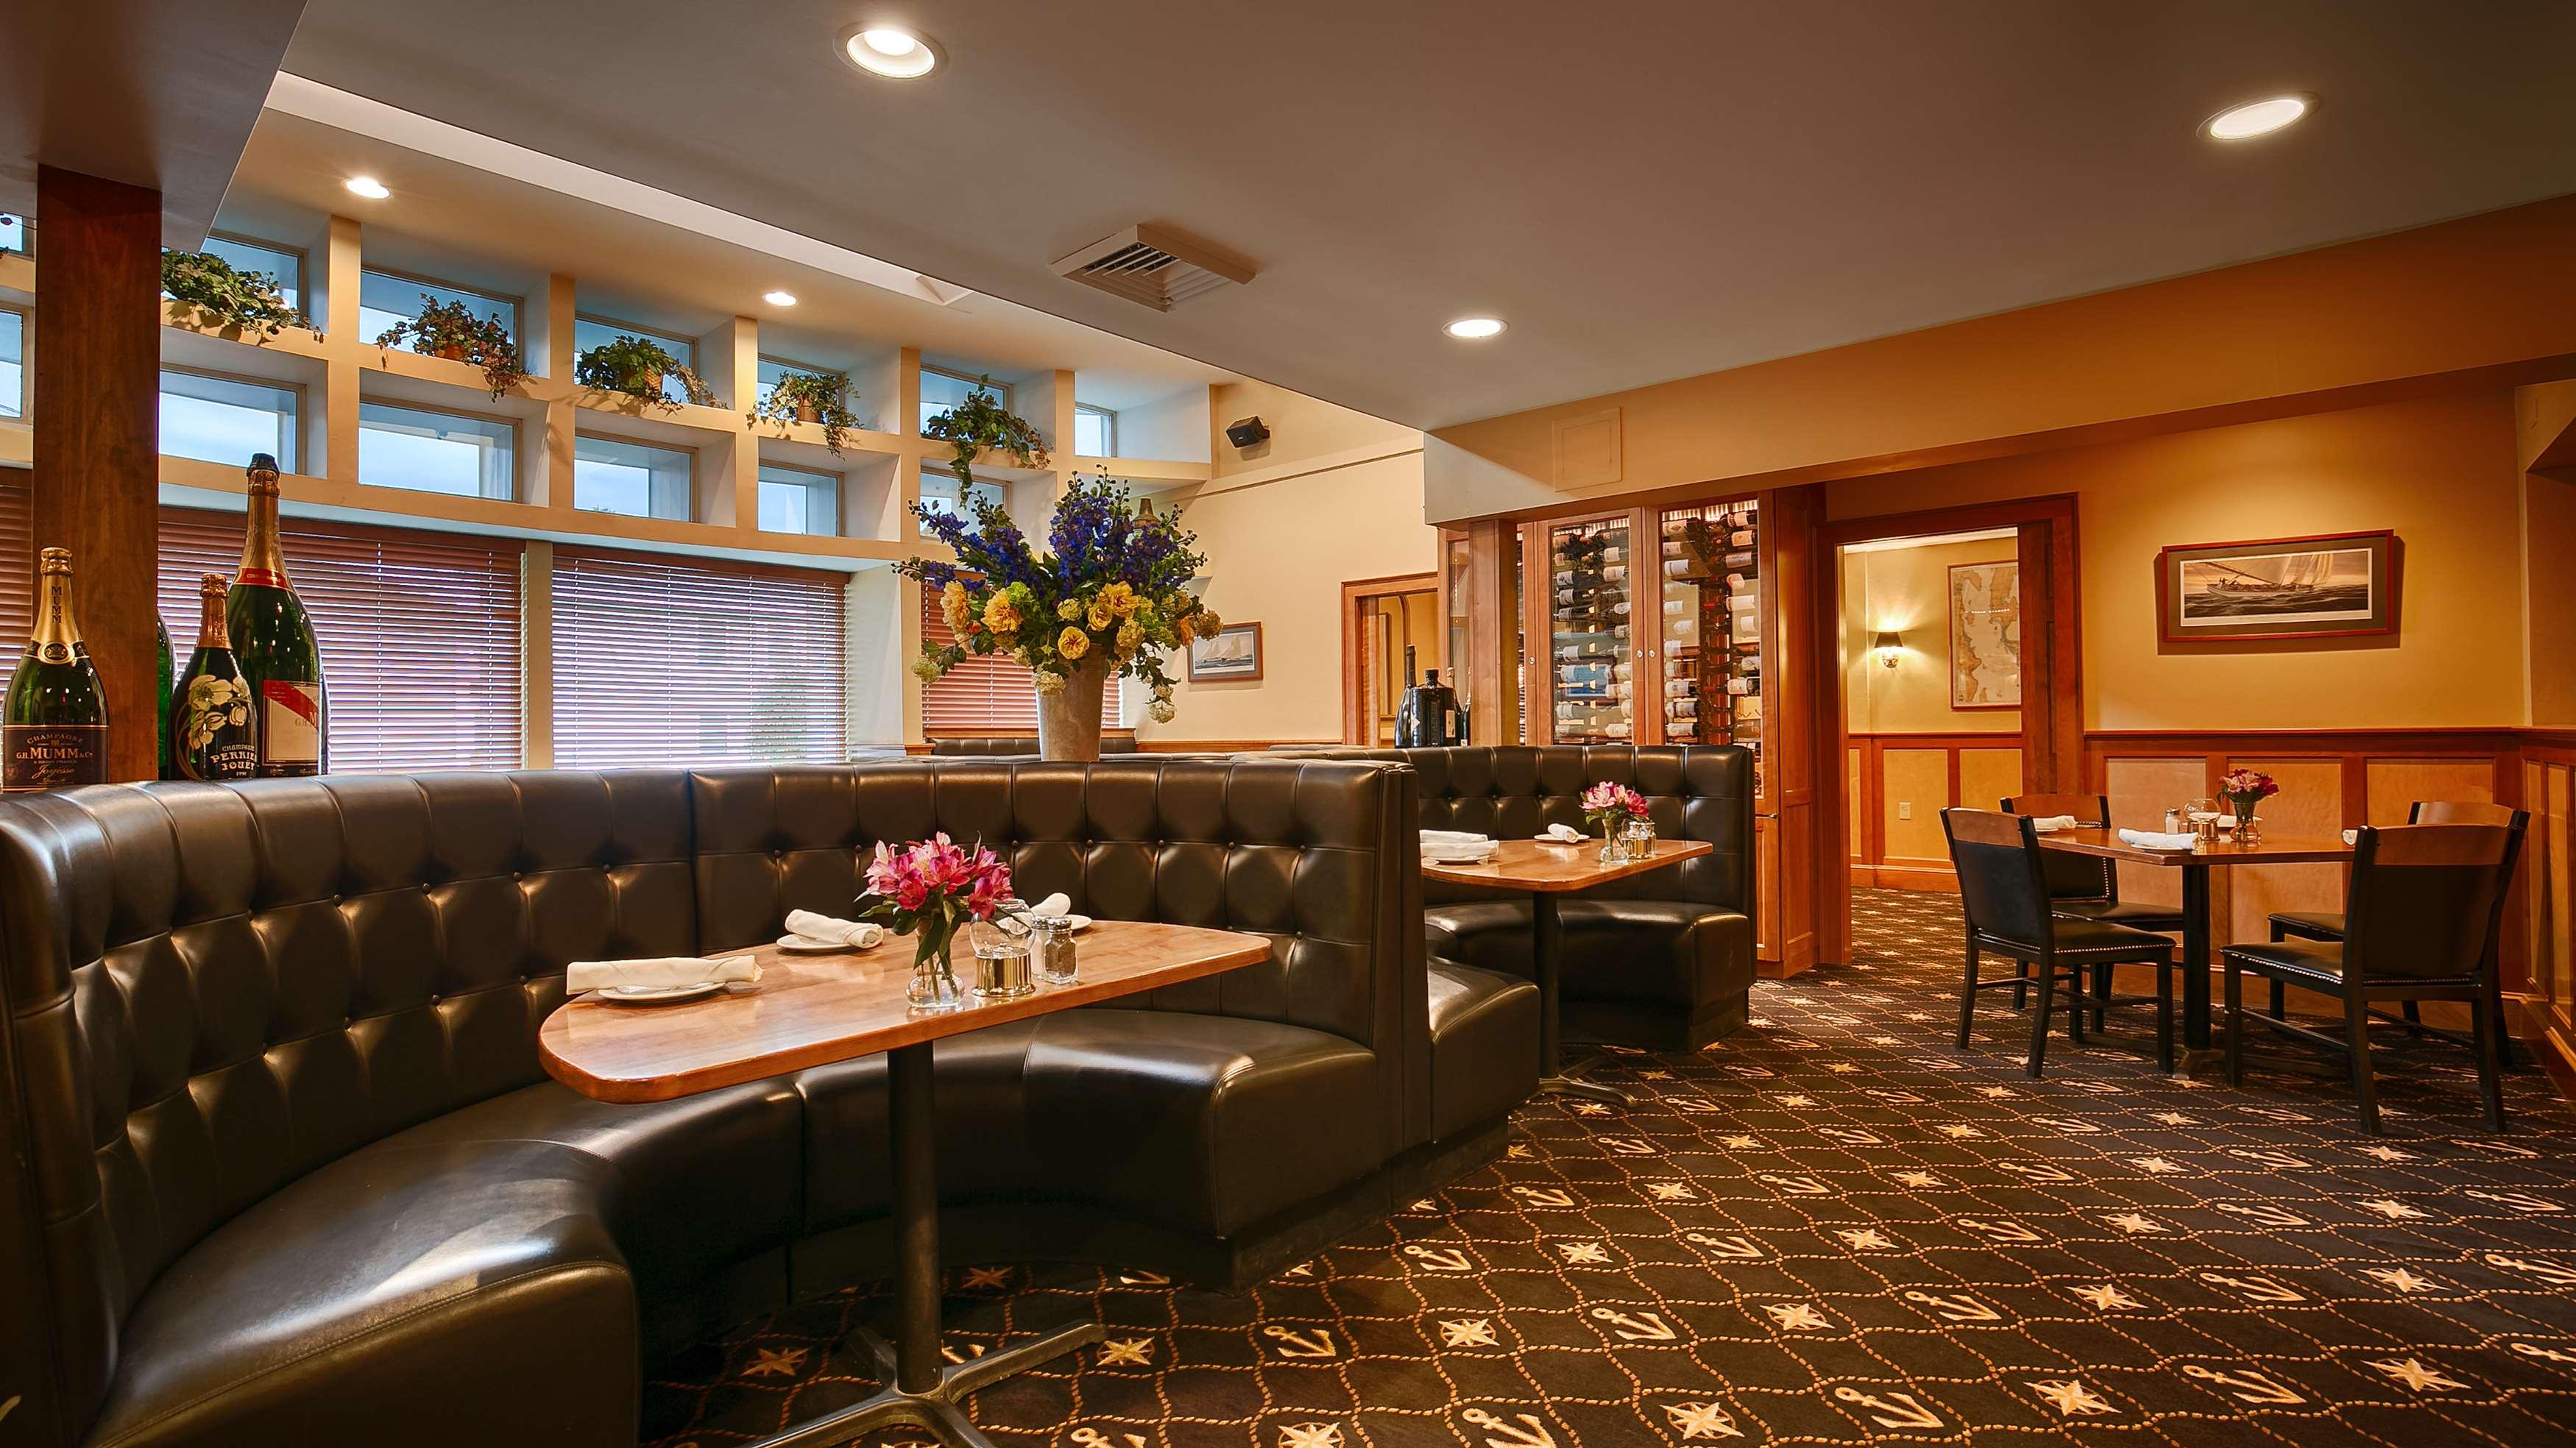 Best Western Plus Windjammer Inn & Conference Center image 9